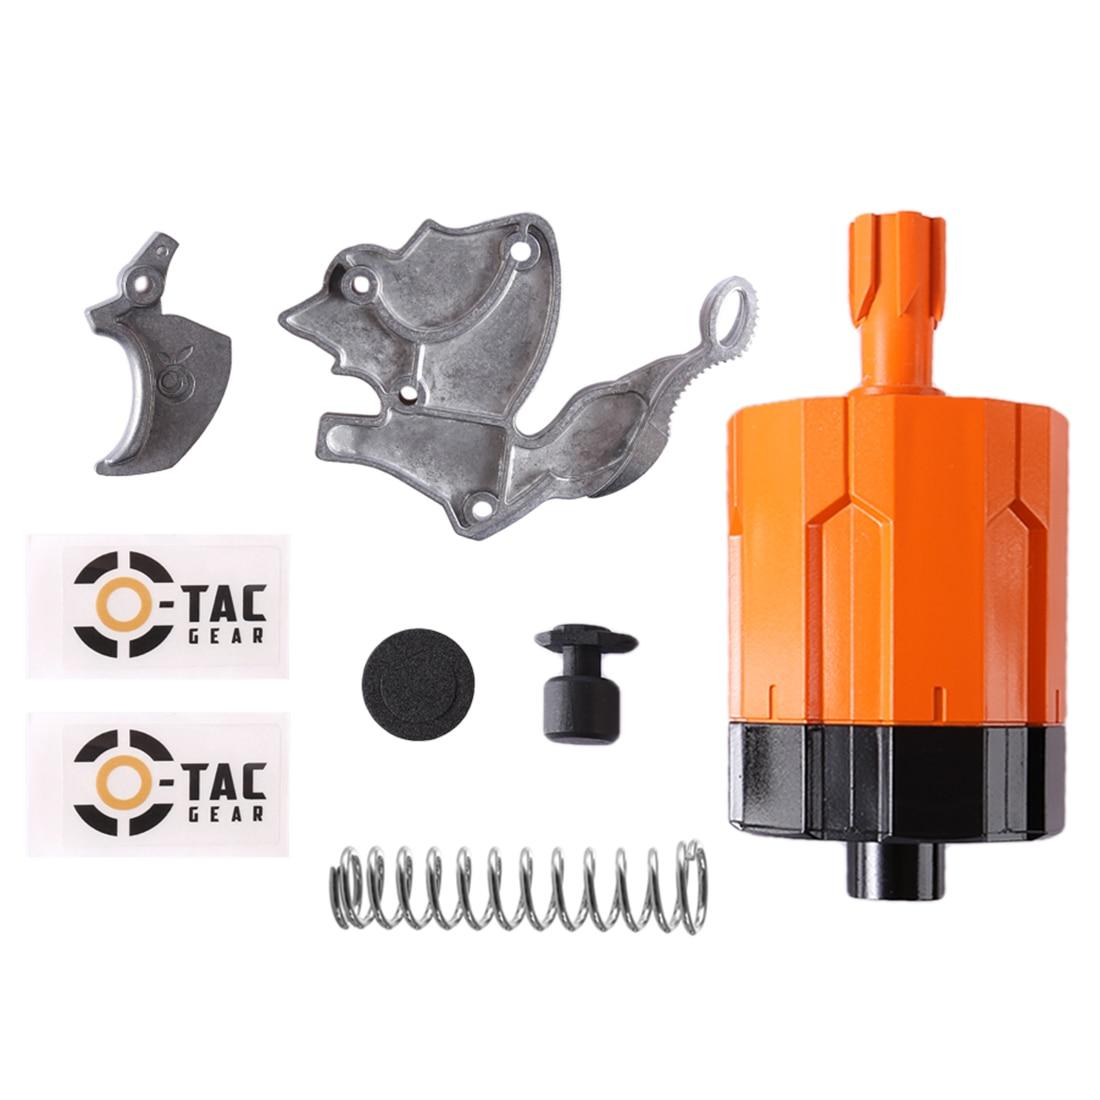 Orange Mod Works Hand-made Limited Edition Modified Kit for Nerf Zombie Strike Hammershot Blaster